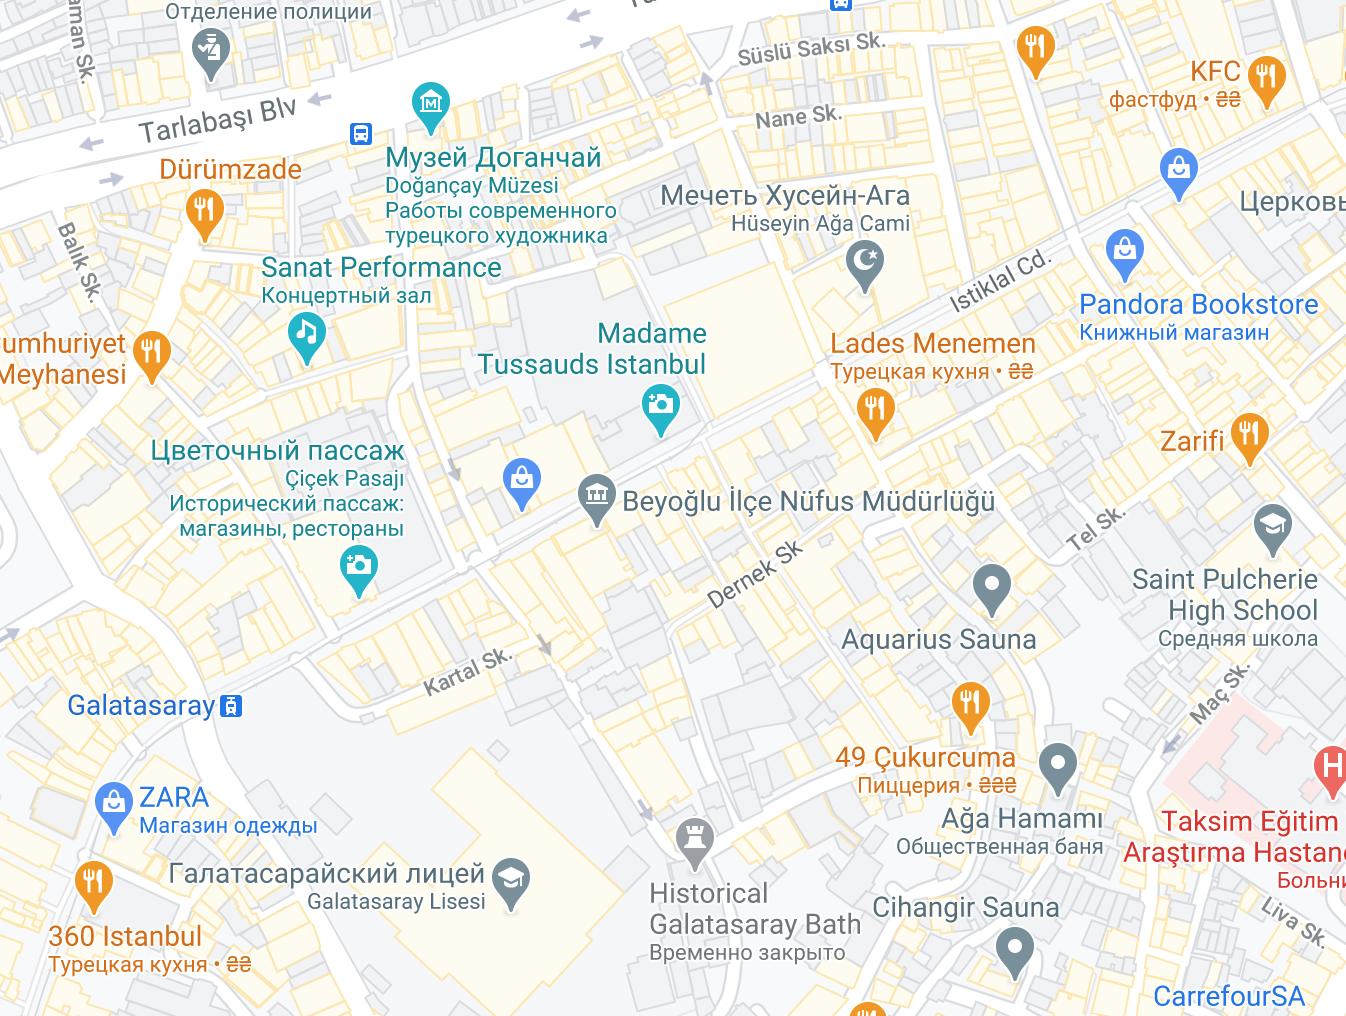 Проспект Истикляль на карте Стамбула